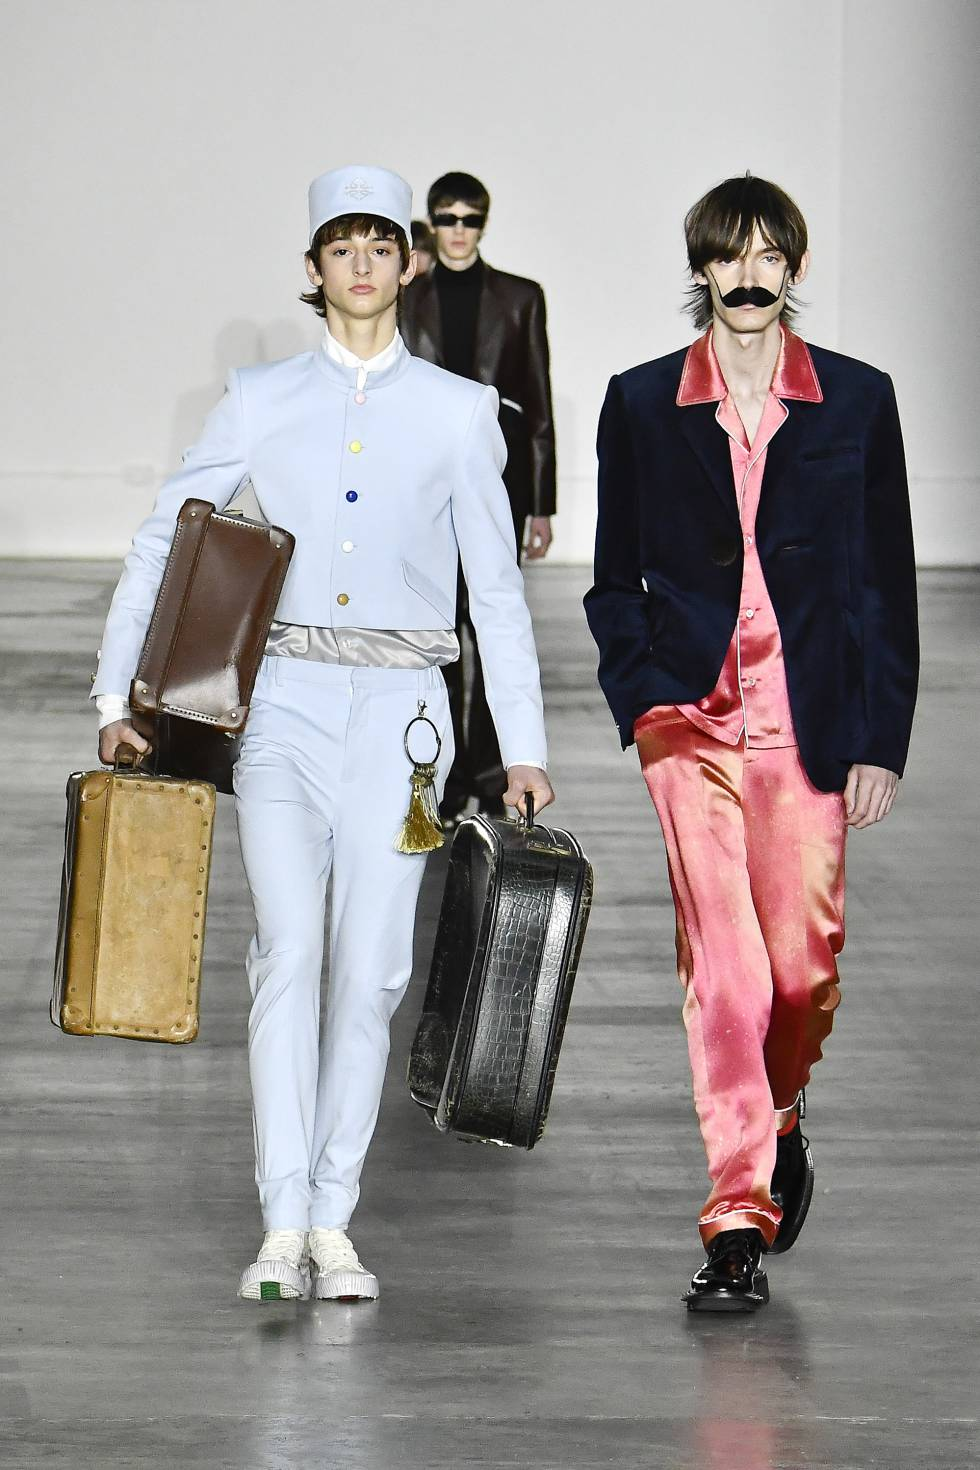 Desfile de la firma 8ON8 este pasado enero en la semana de la moda masculina de Londres.